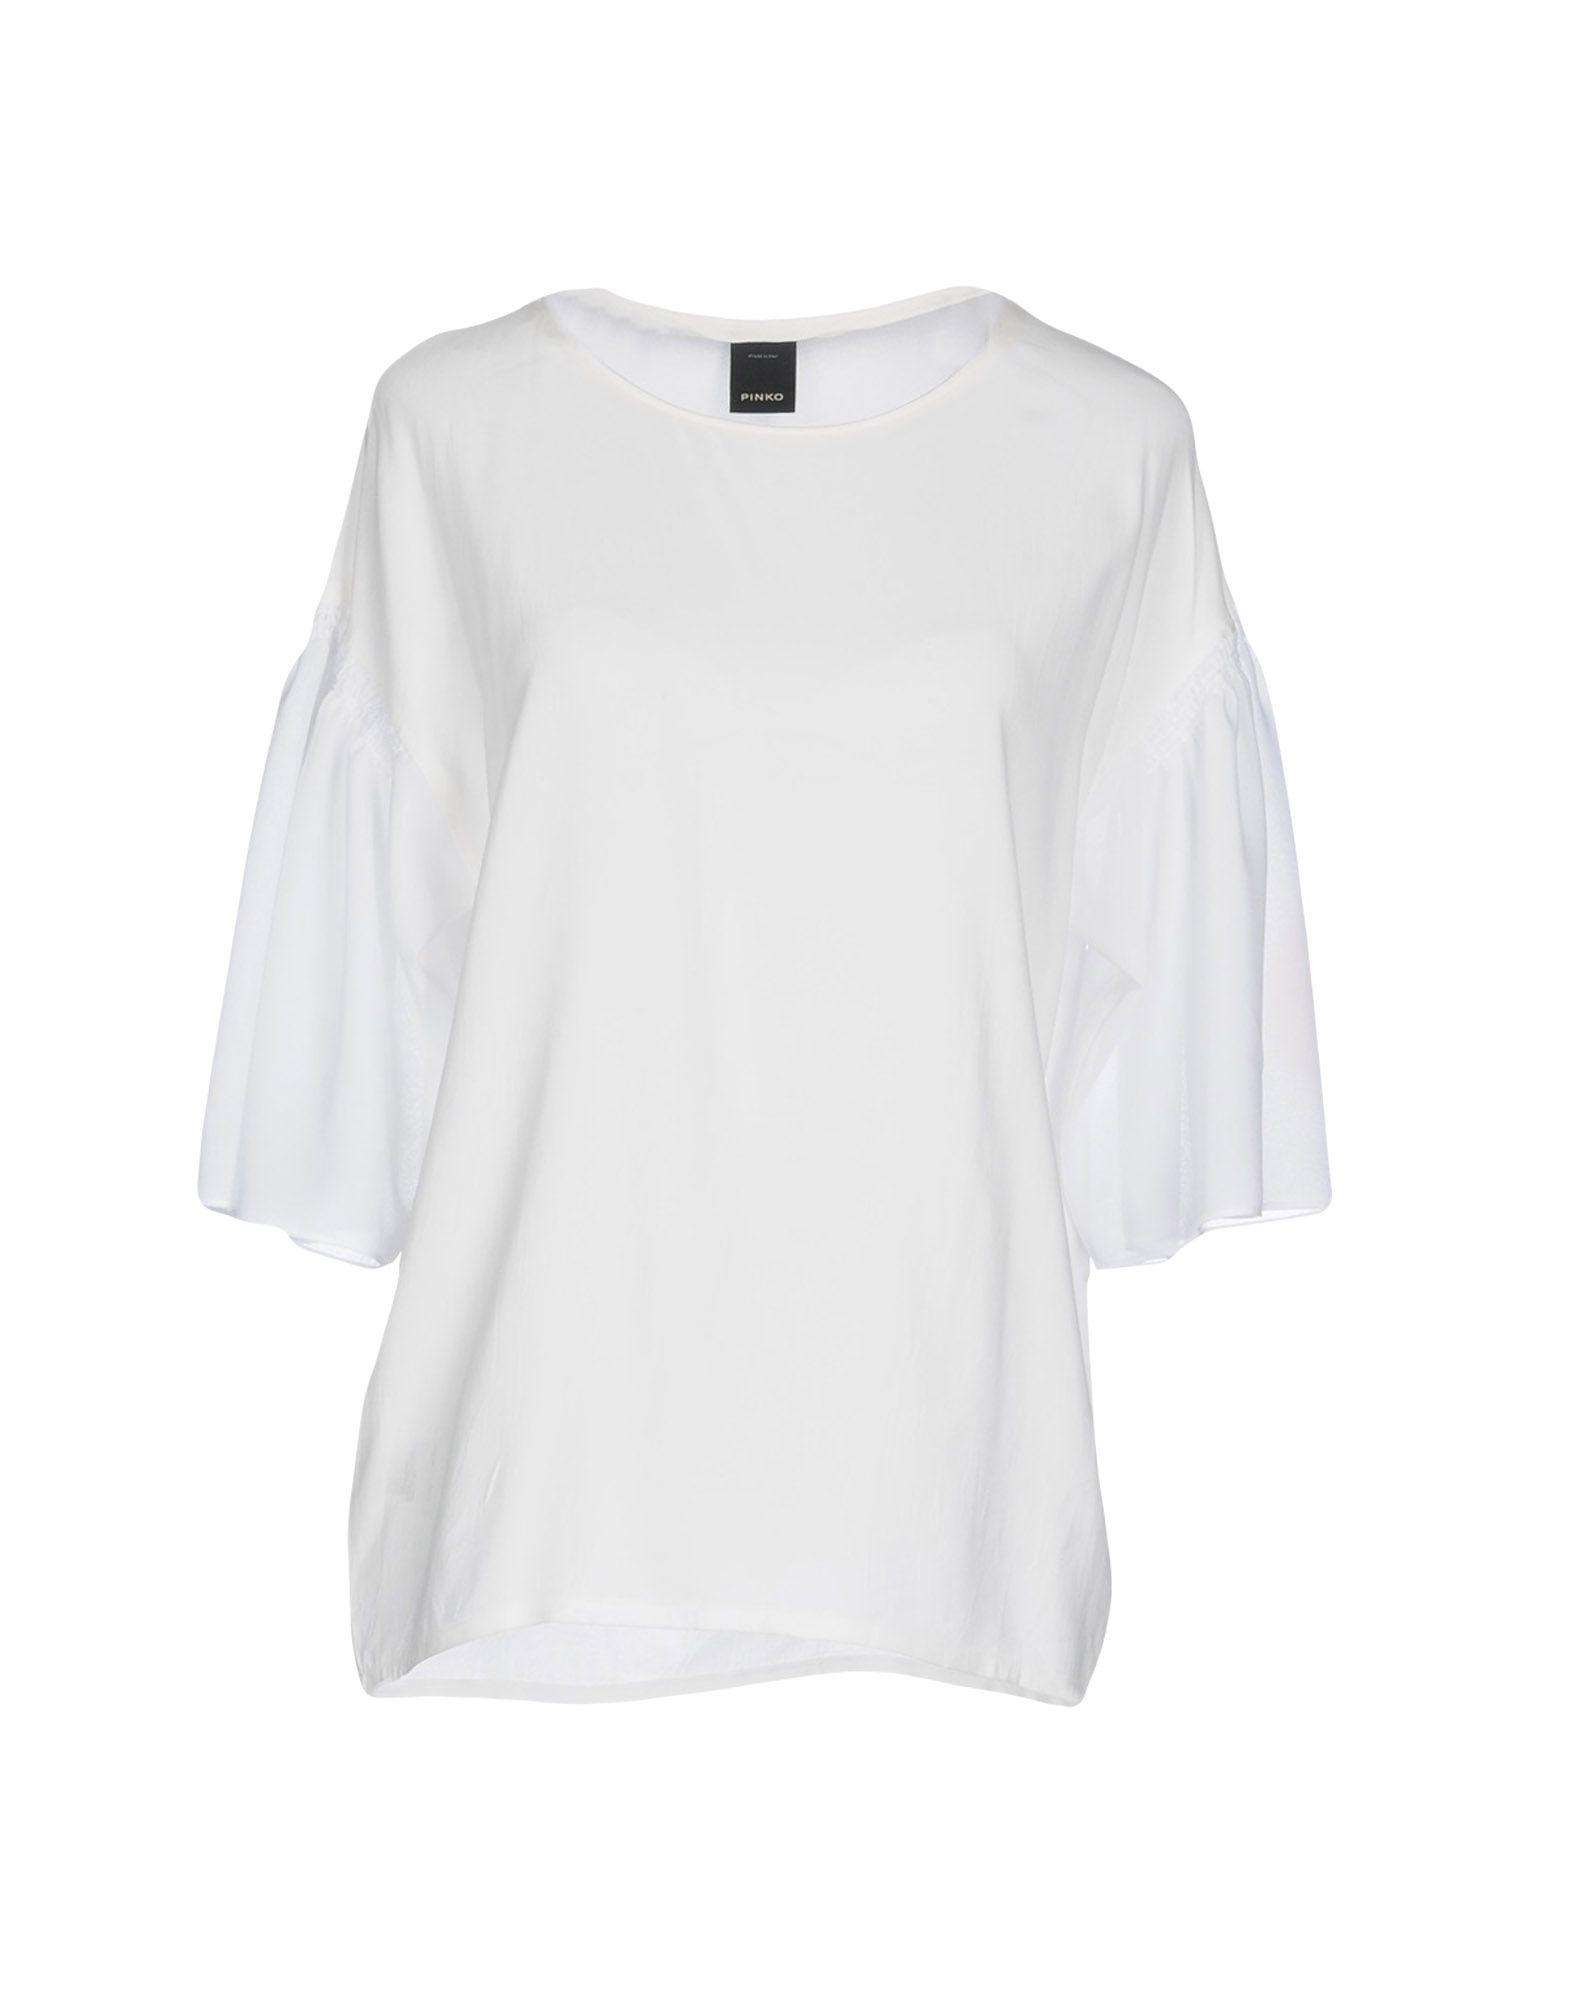 ФОТО pinko блузка